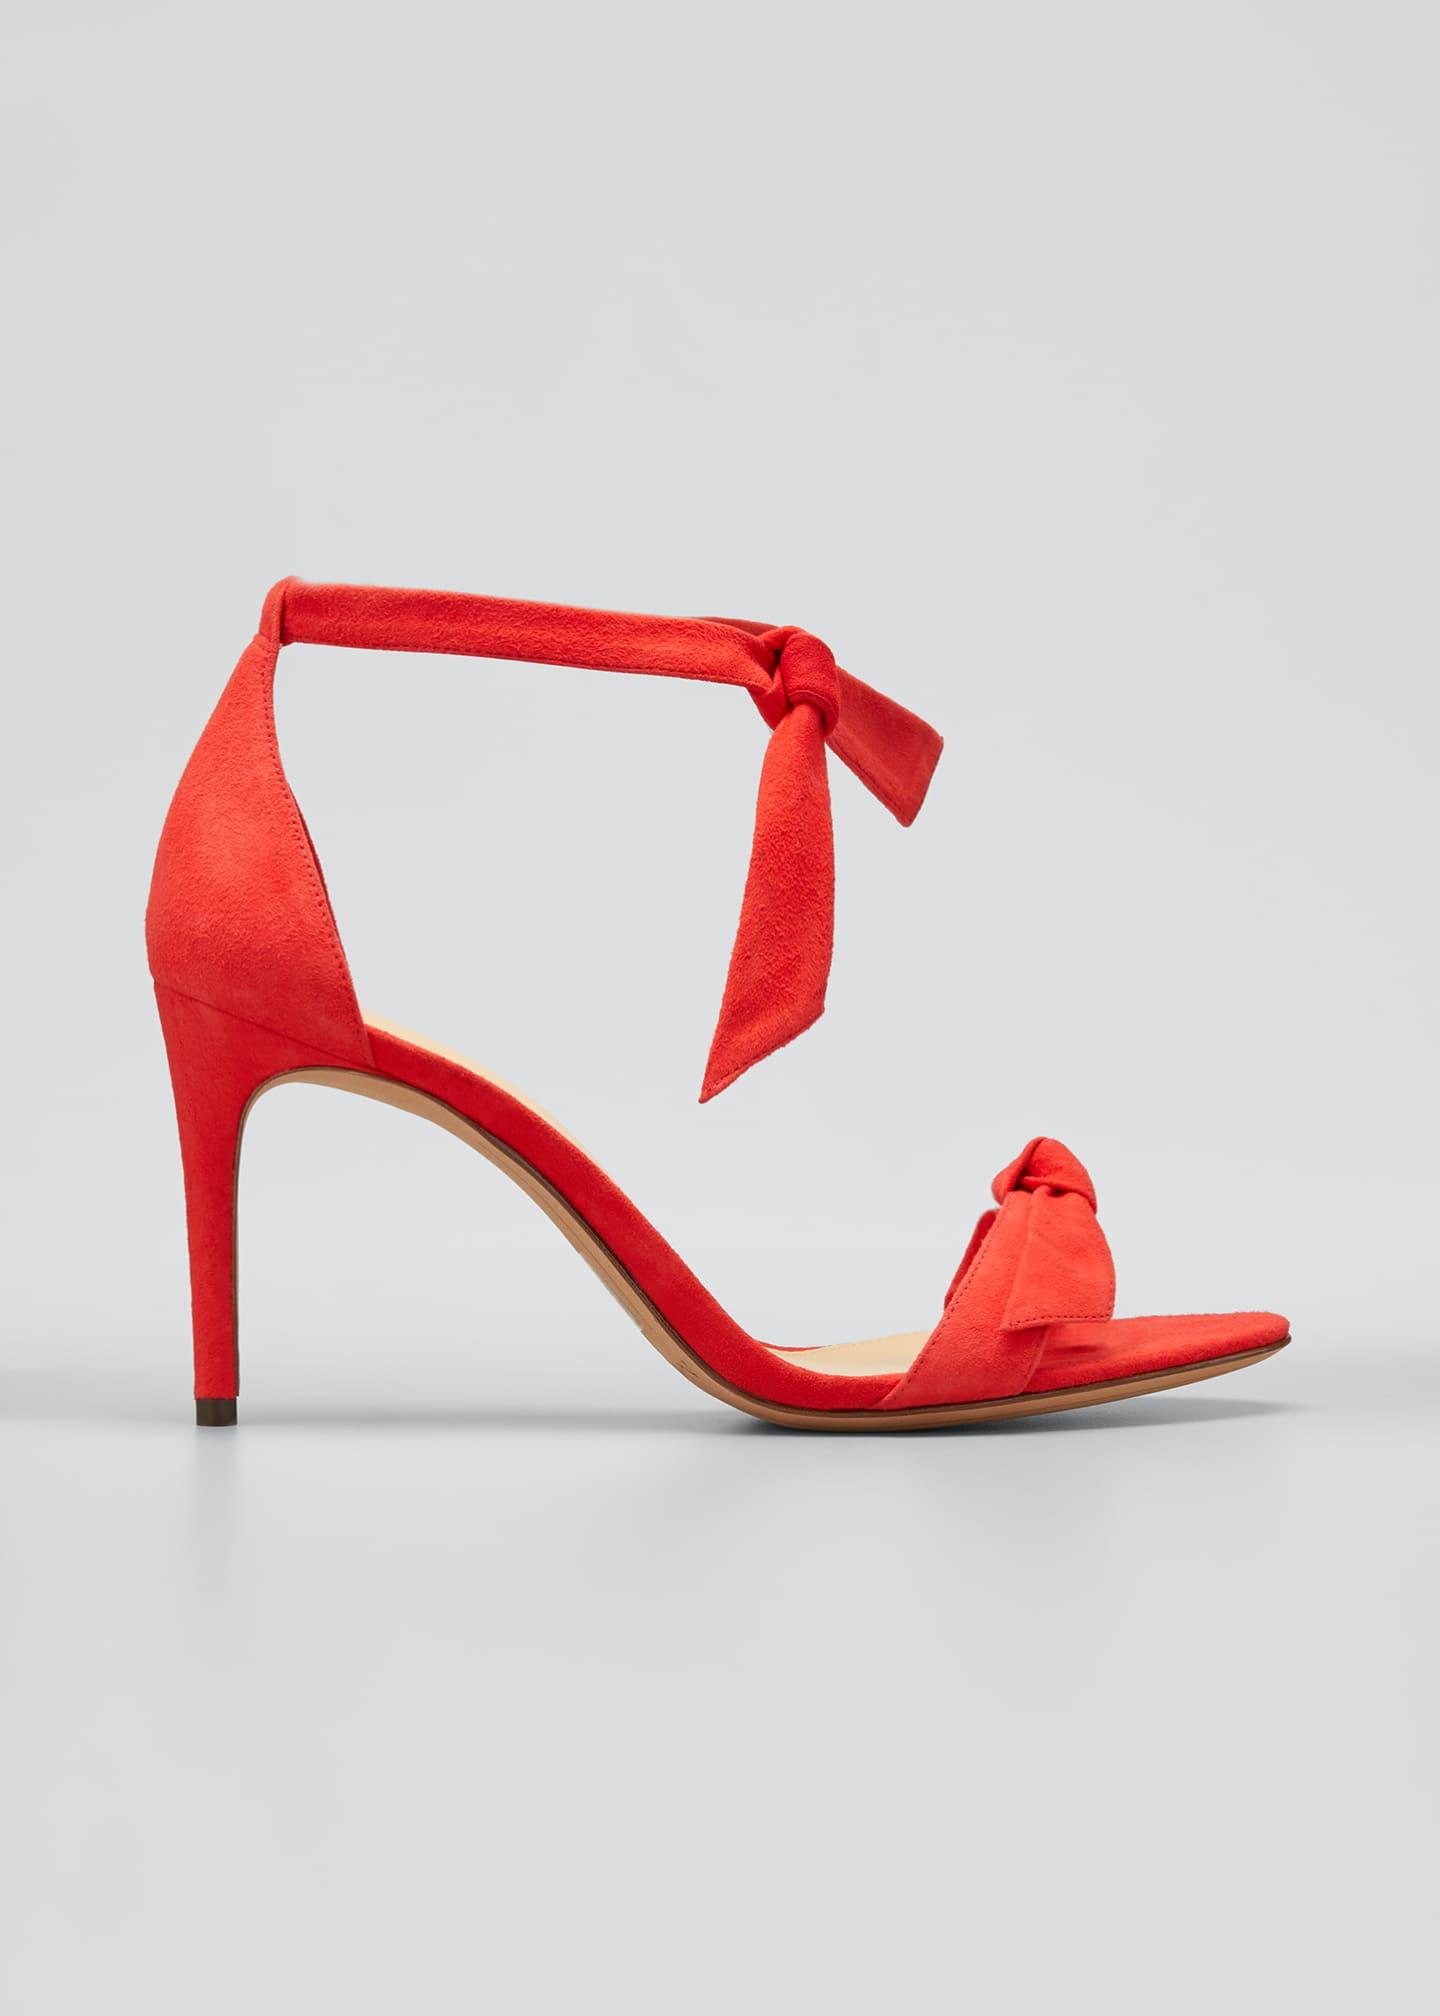 Alexandre Birman Clarita 85mm Suede Ankle-Tie Sandals